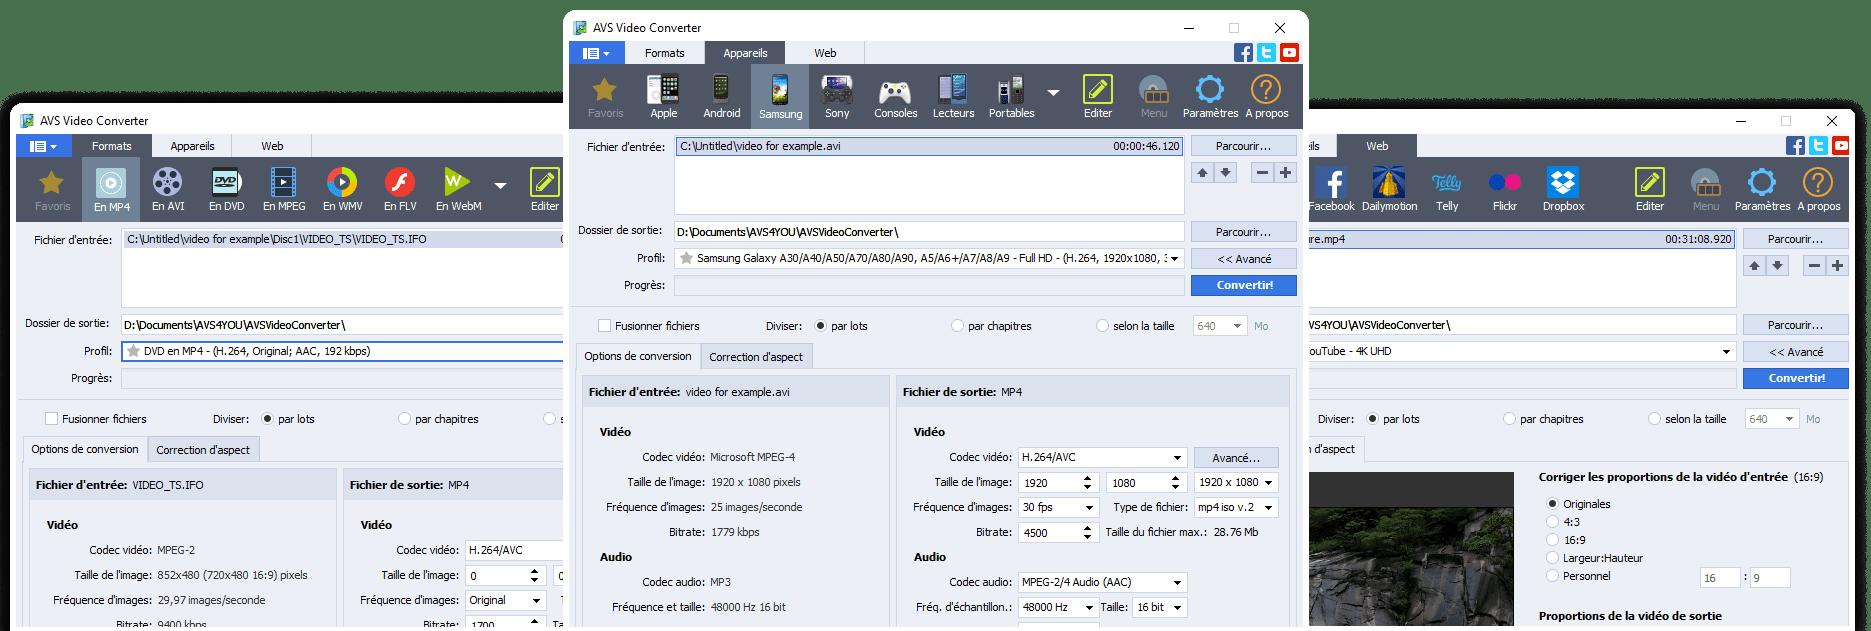 Capture d'écran AVS Video Converter